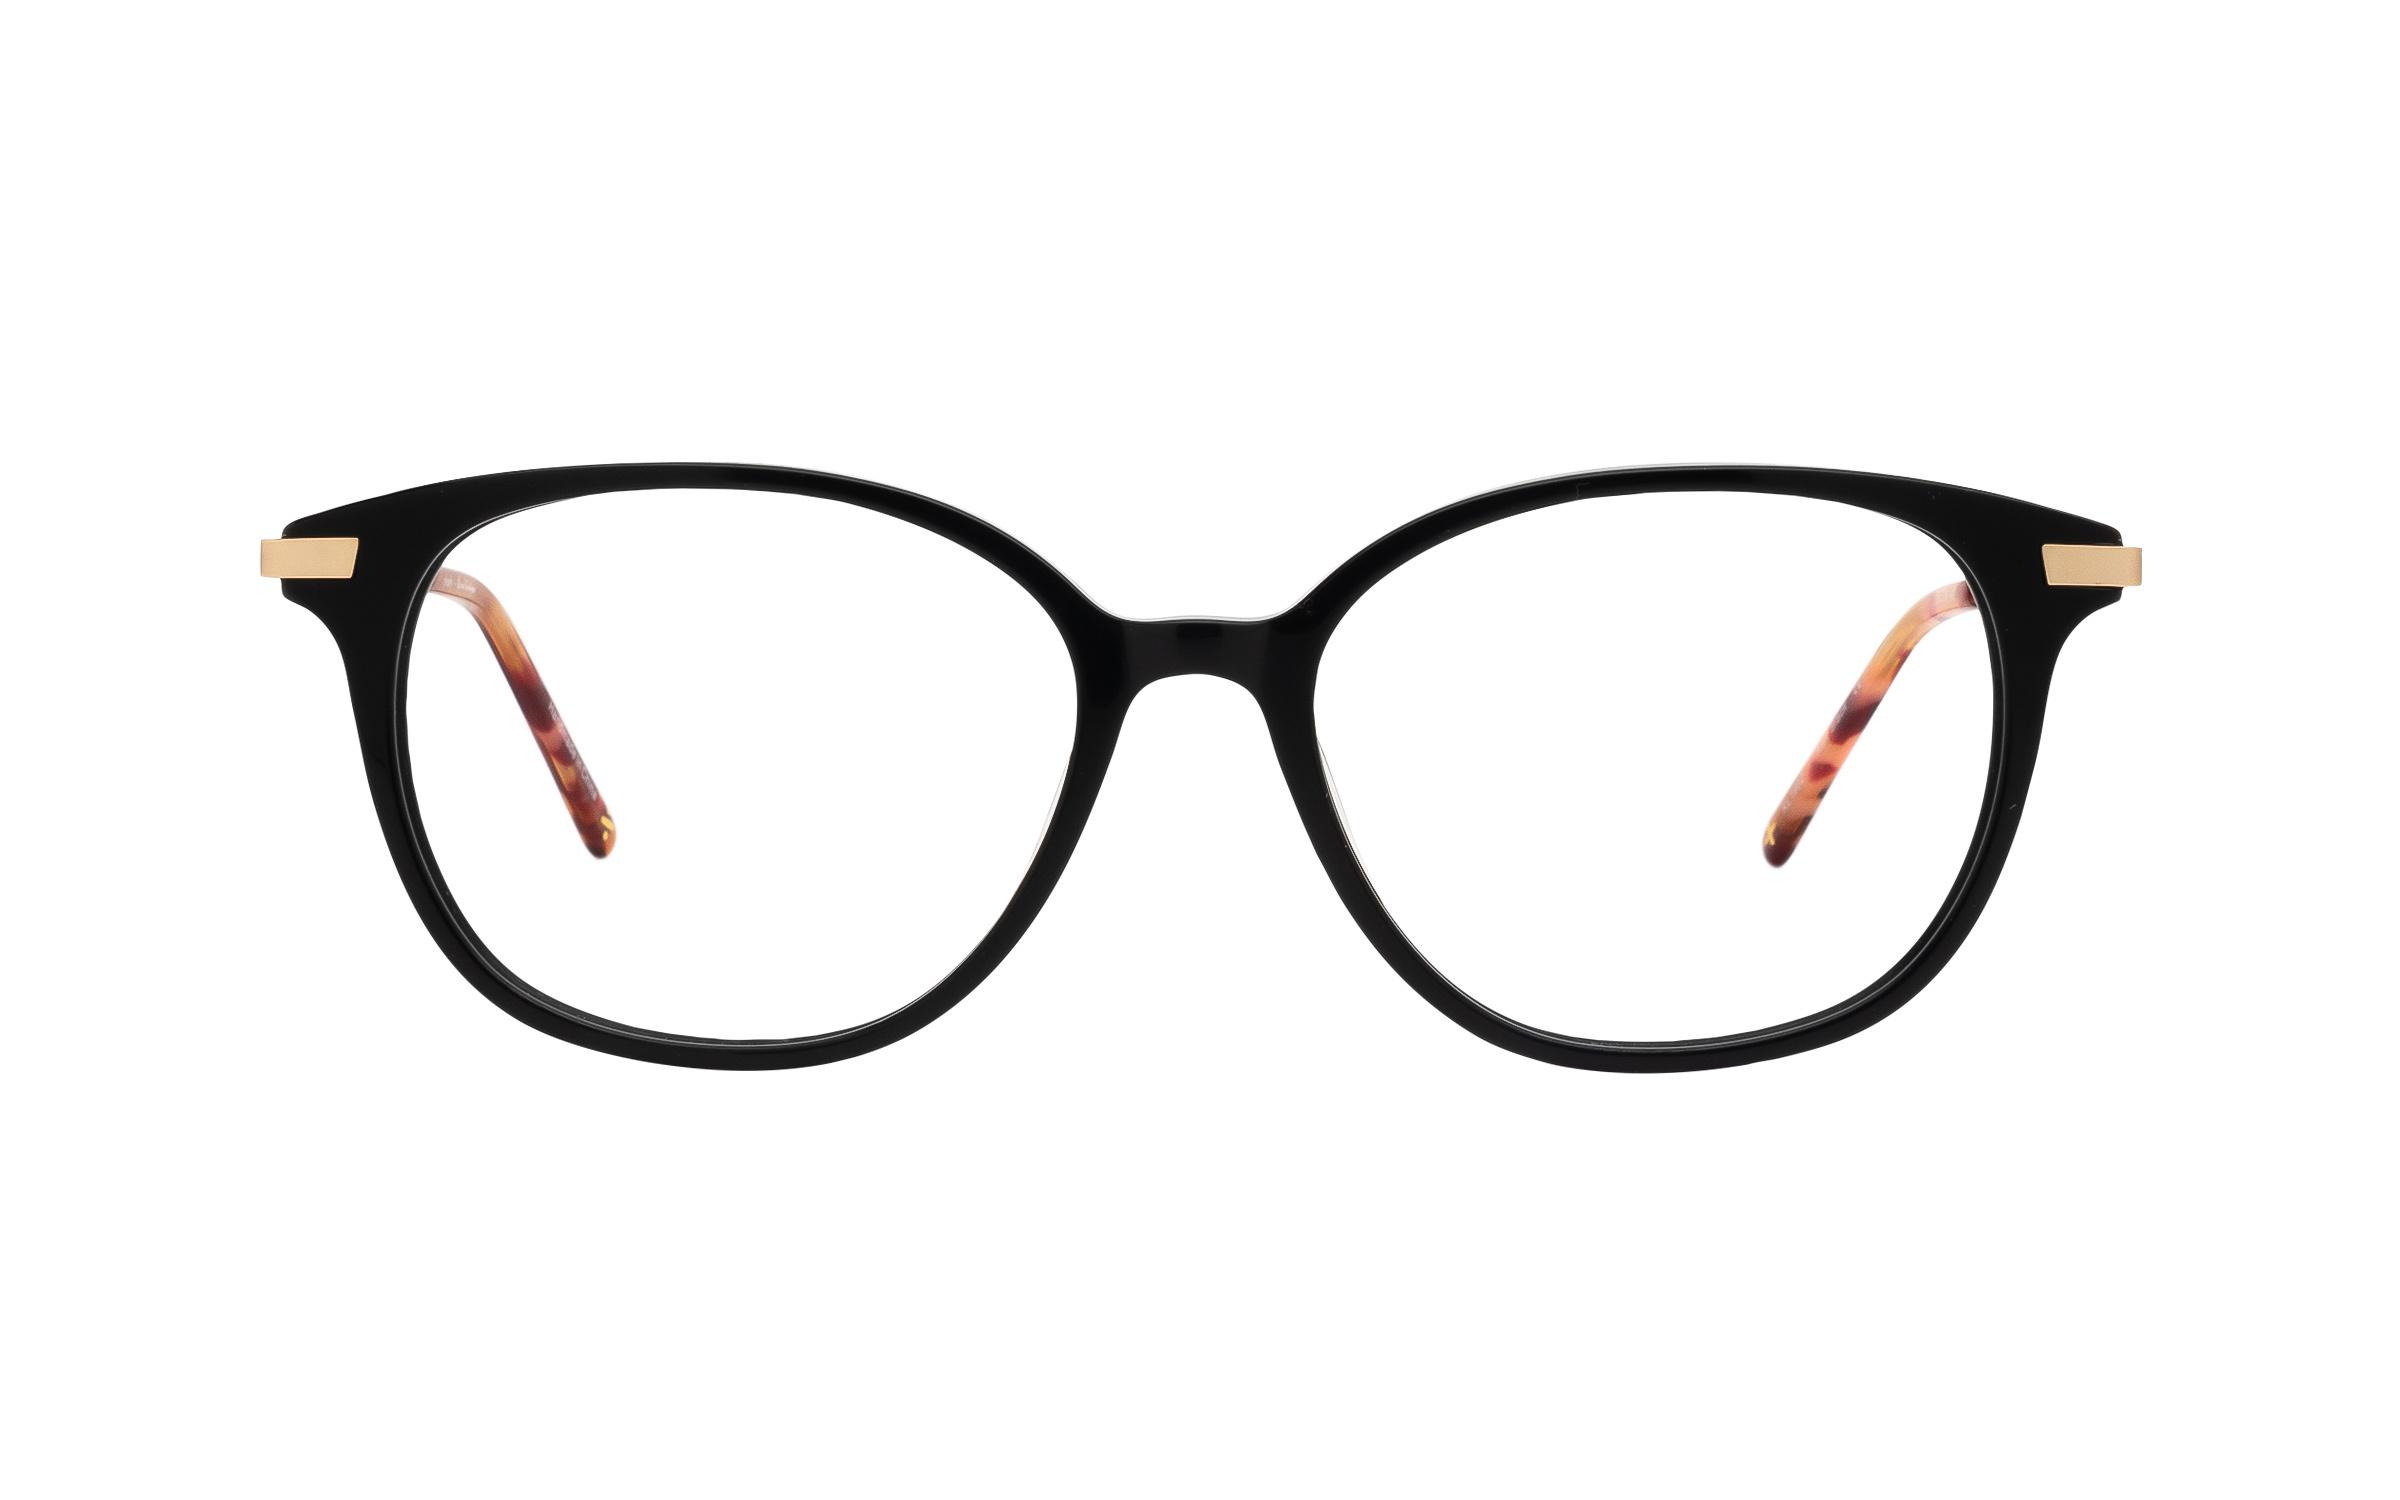 coastal.com - Derek Cardigan Kari (53) Eyeglasses and Frame in Black | Acetate/Metal – Online Coastal 55.00 USD